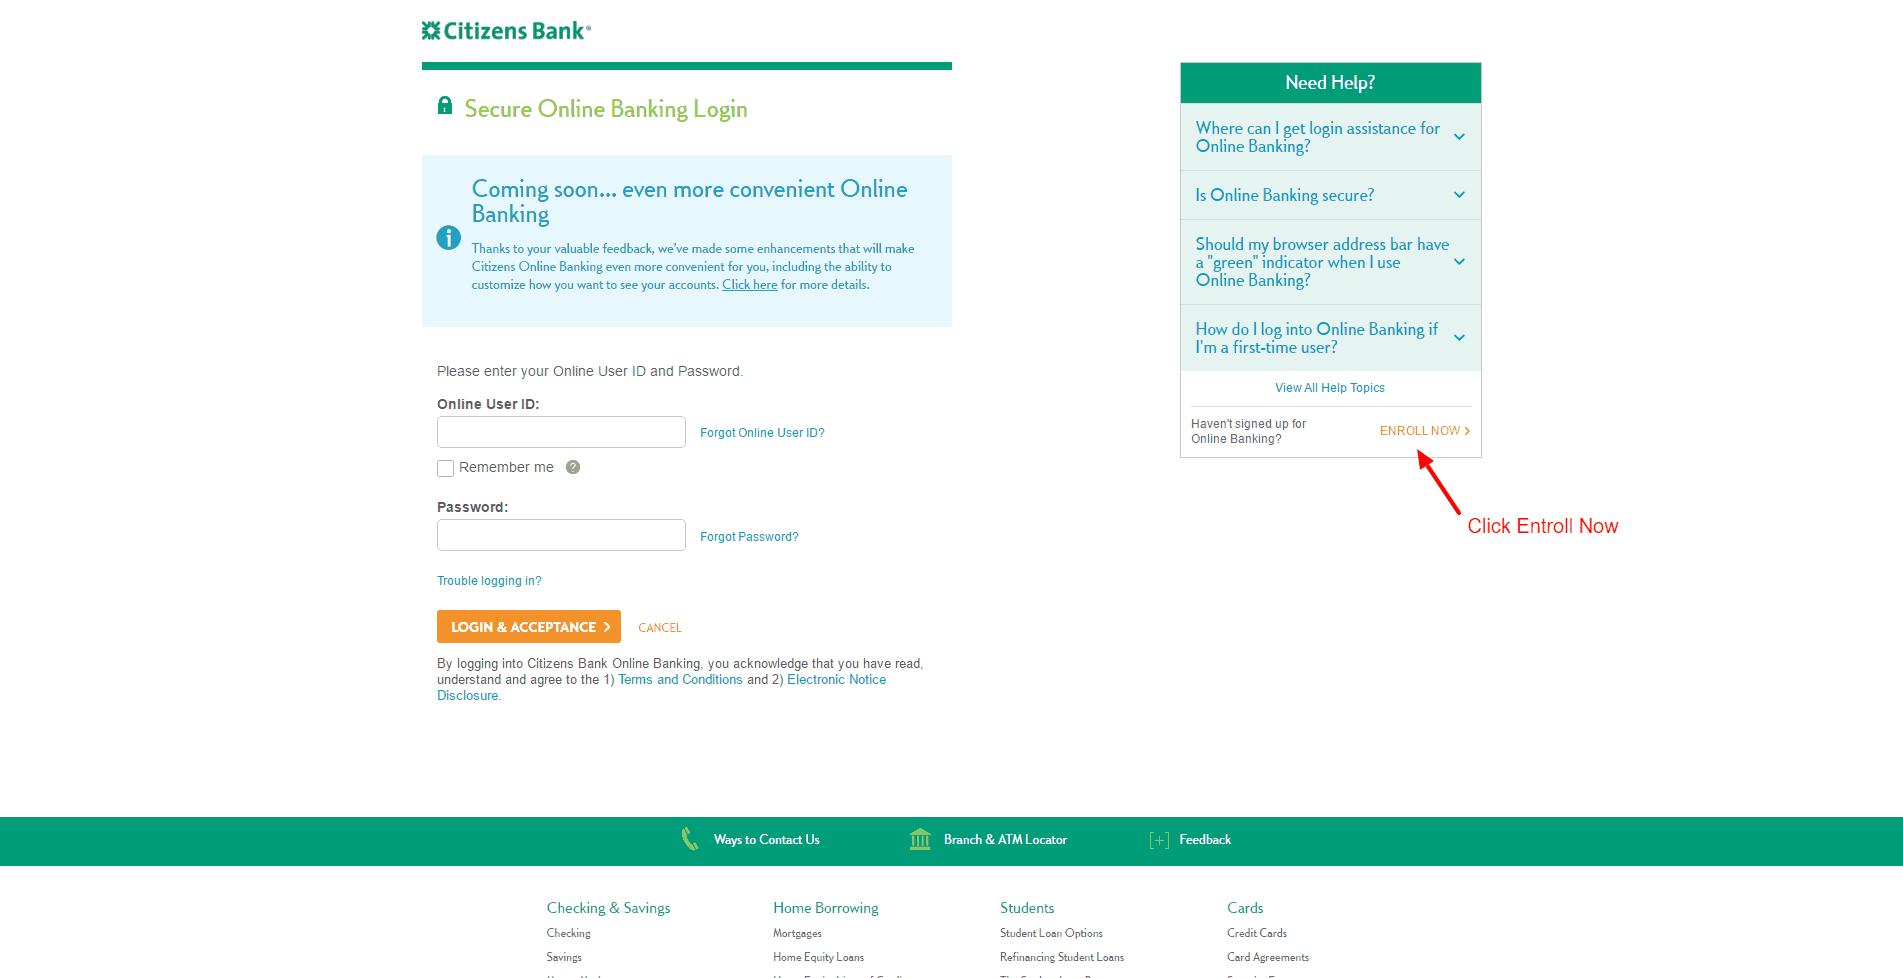 03_citizens-bank_apply_02